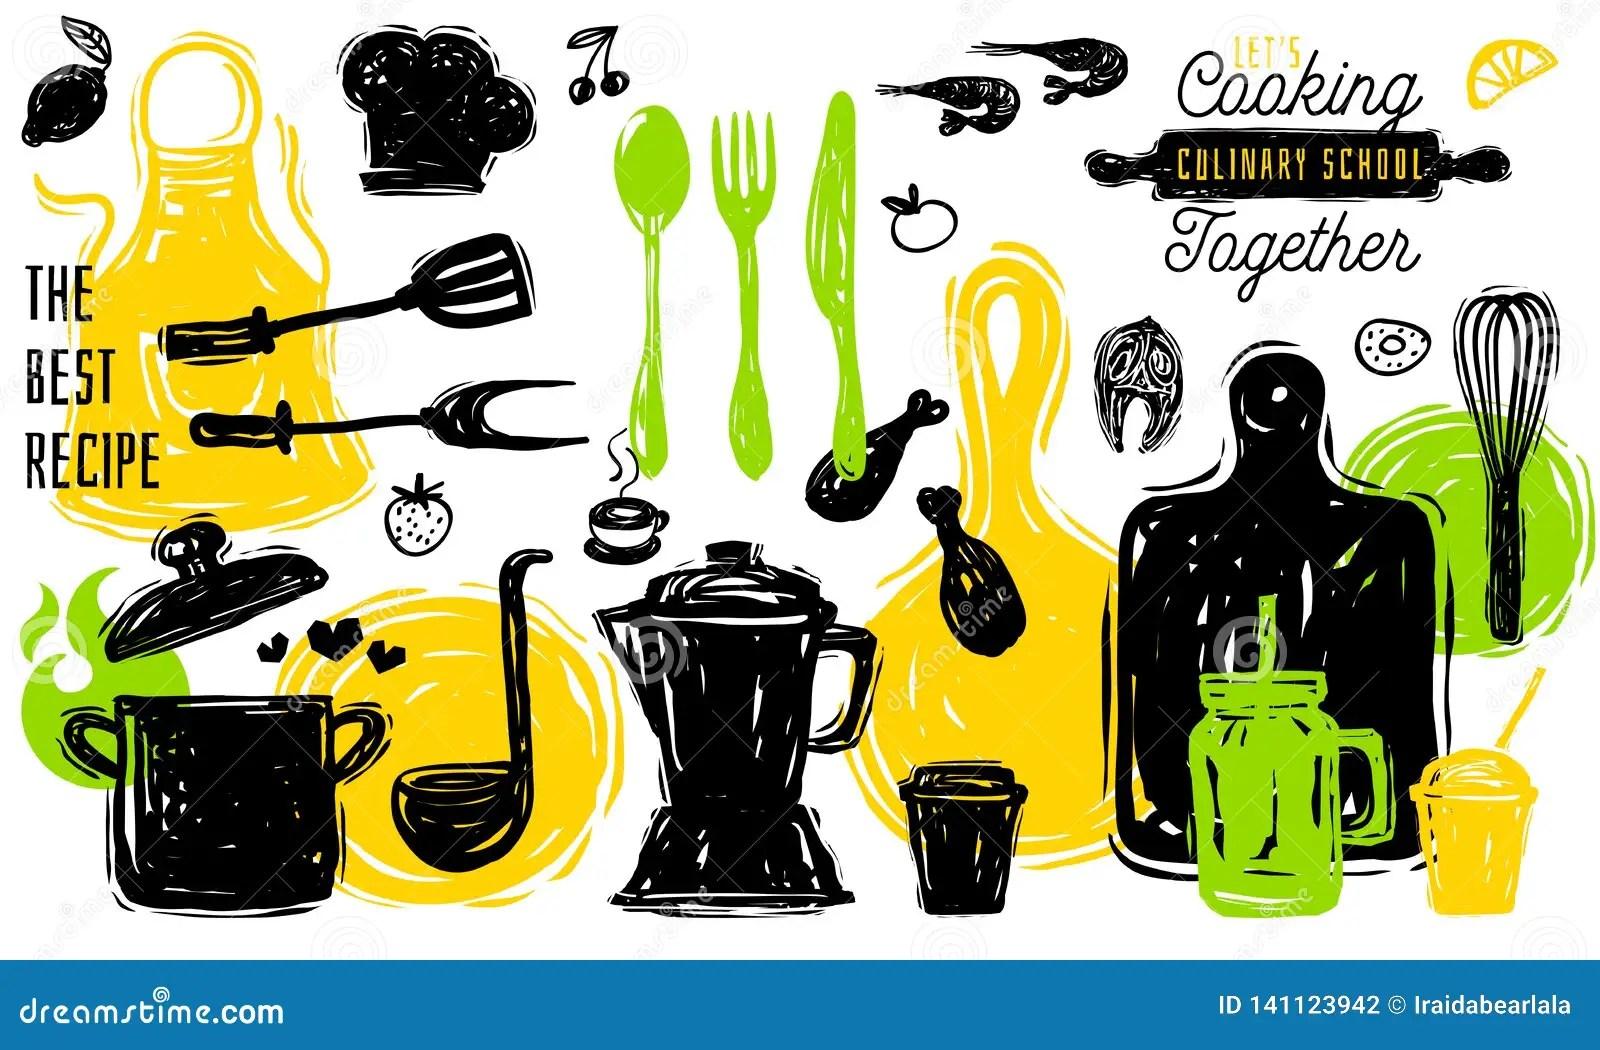 Culinary School Logo Design Label Sticker Poster Banner